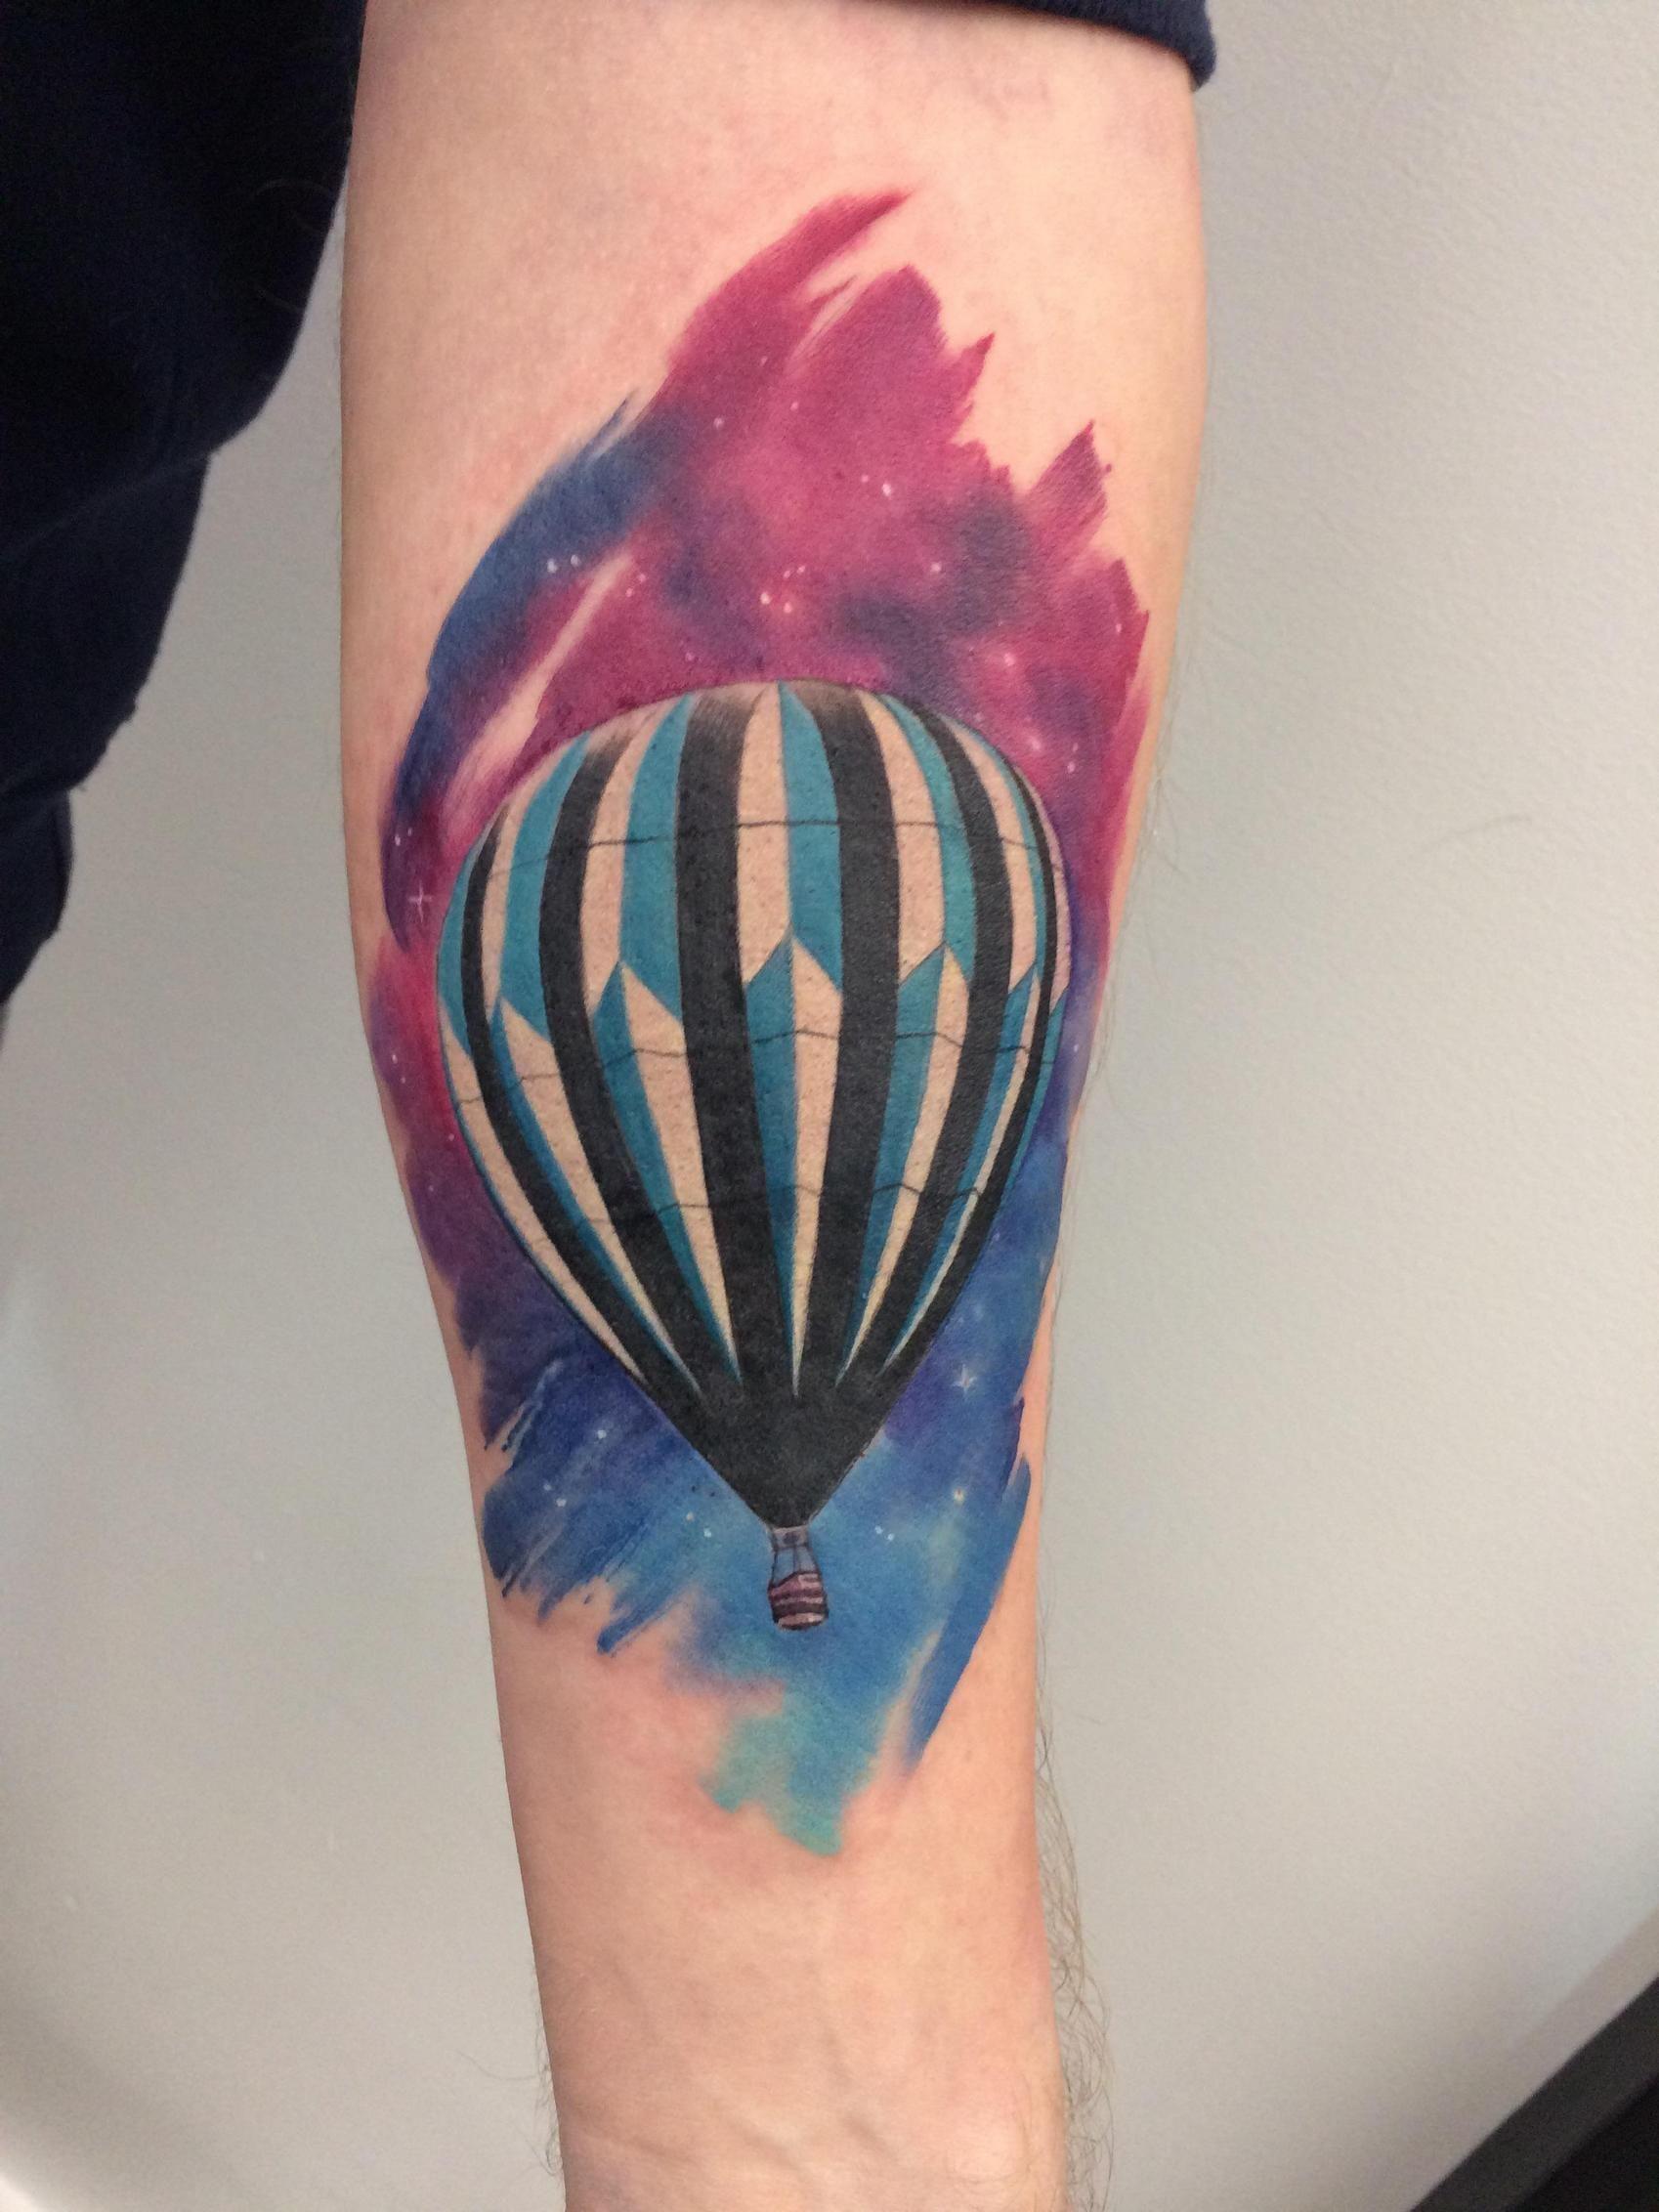 25 Amazing Watercolor Tattoos Air Balloon Tattoo Balloon Tattoo